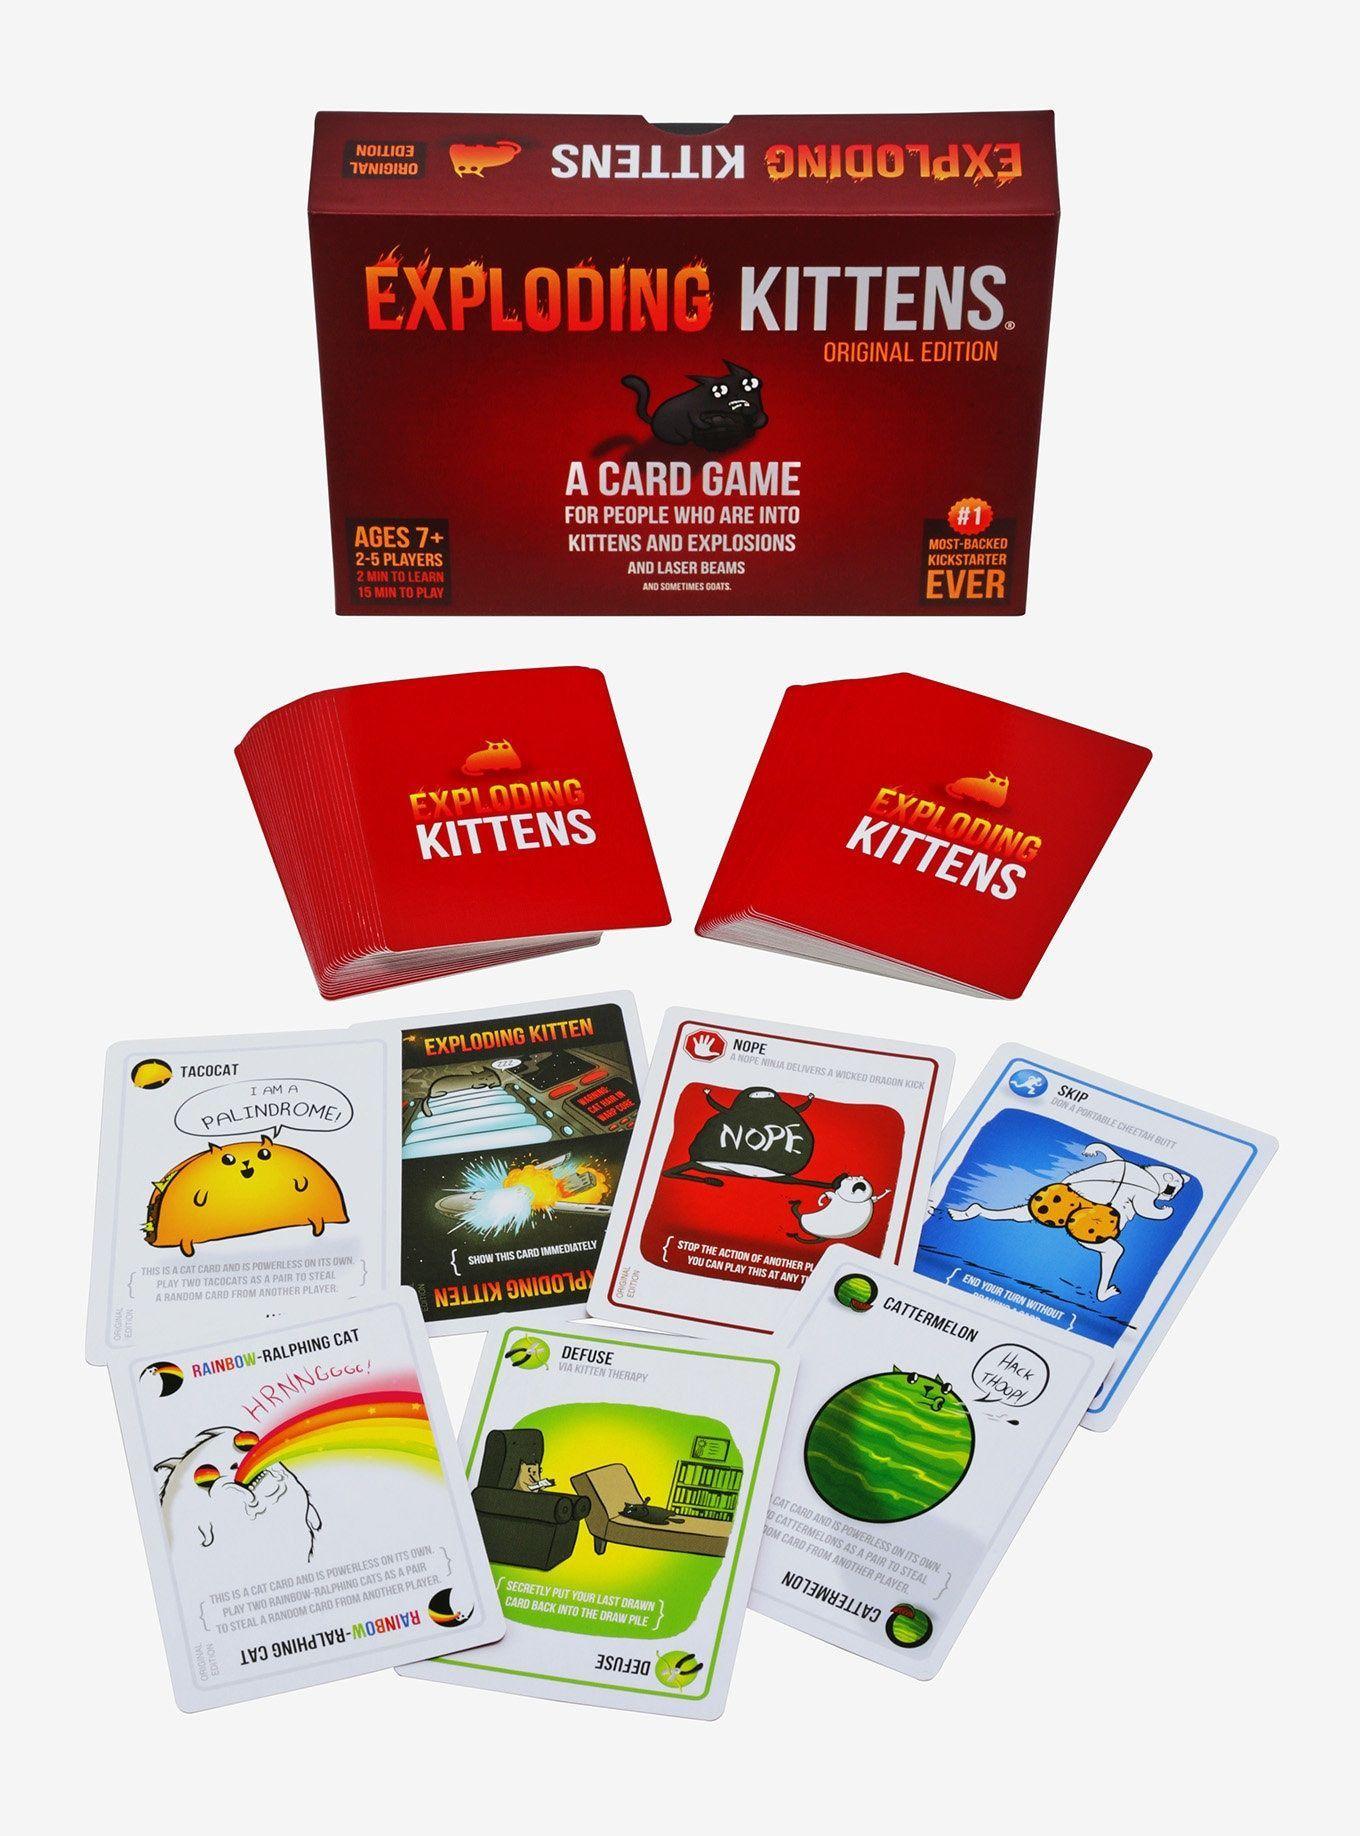 Insects Exploding Kittens Exploding Kittens Bengal Kitten Kitten Party Kittens Videos Adorable In 2020 Exploding Kittens Card Game Exploding Kittens Card Games